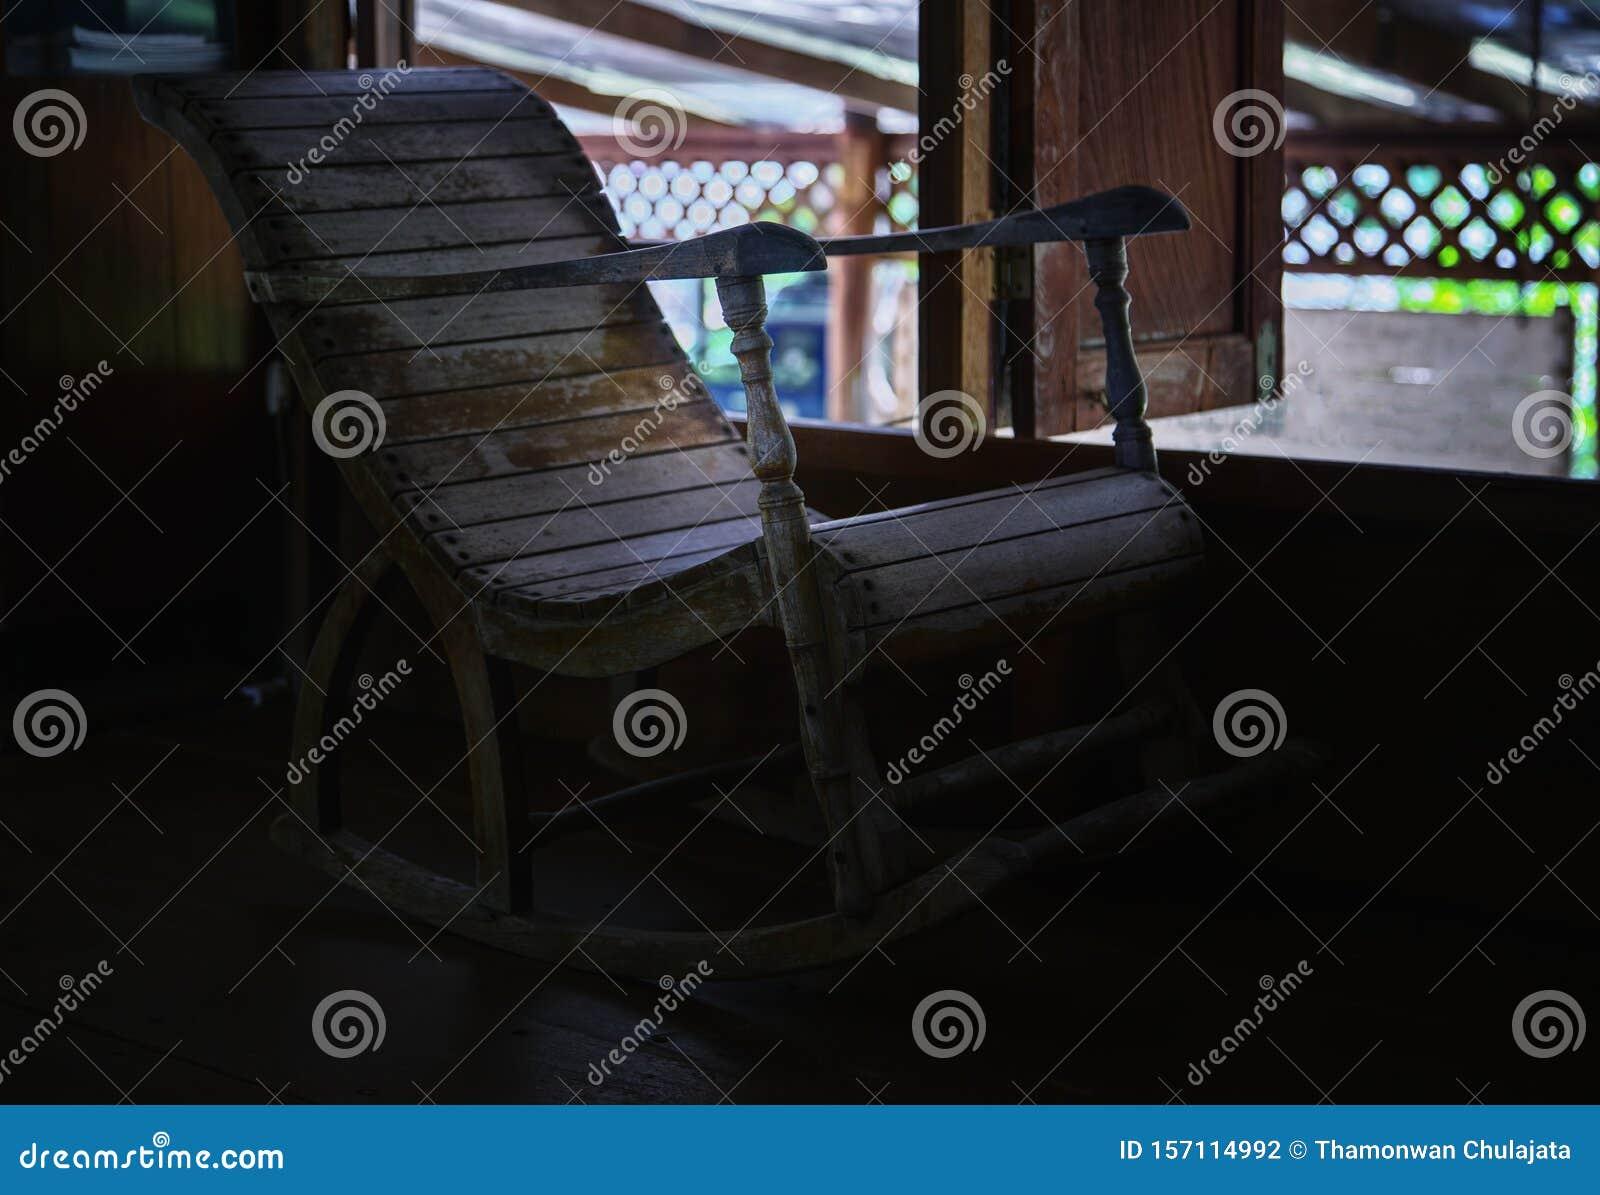 Miraculous Old Rocking Chair Stock Photo Image Of Rocker Seat 157114992 Creativecarmelina Interior Chair Design Creativecarmelinacom